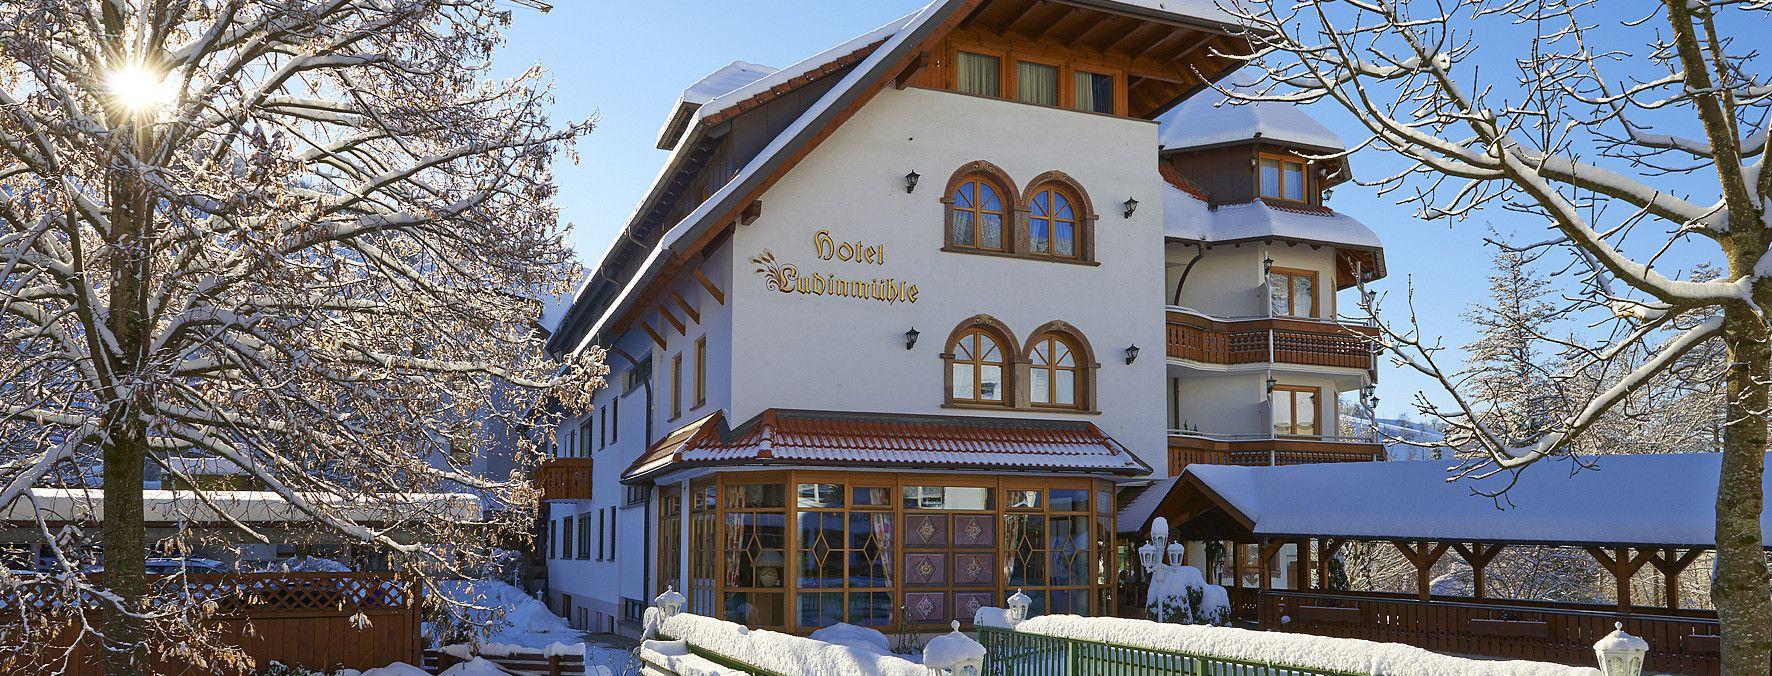 4 Sterne Hotel Schwarzwald Wellnesshotel Ludinmühle